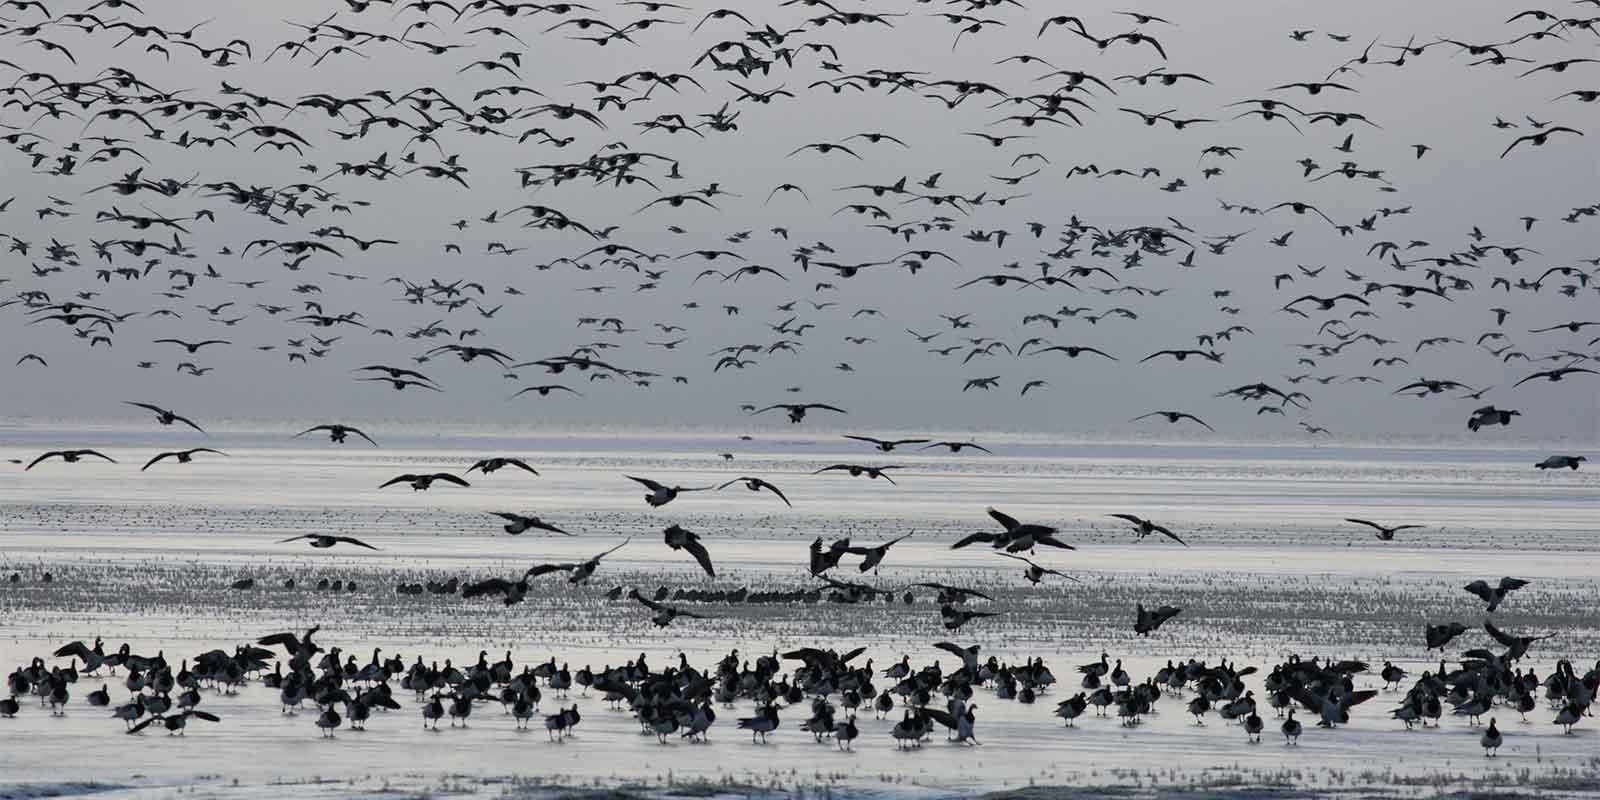 Flock of barnacle geese in flight on Islay Island, Western Isles, Scotland